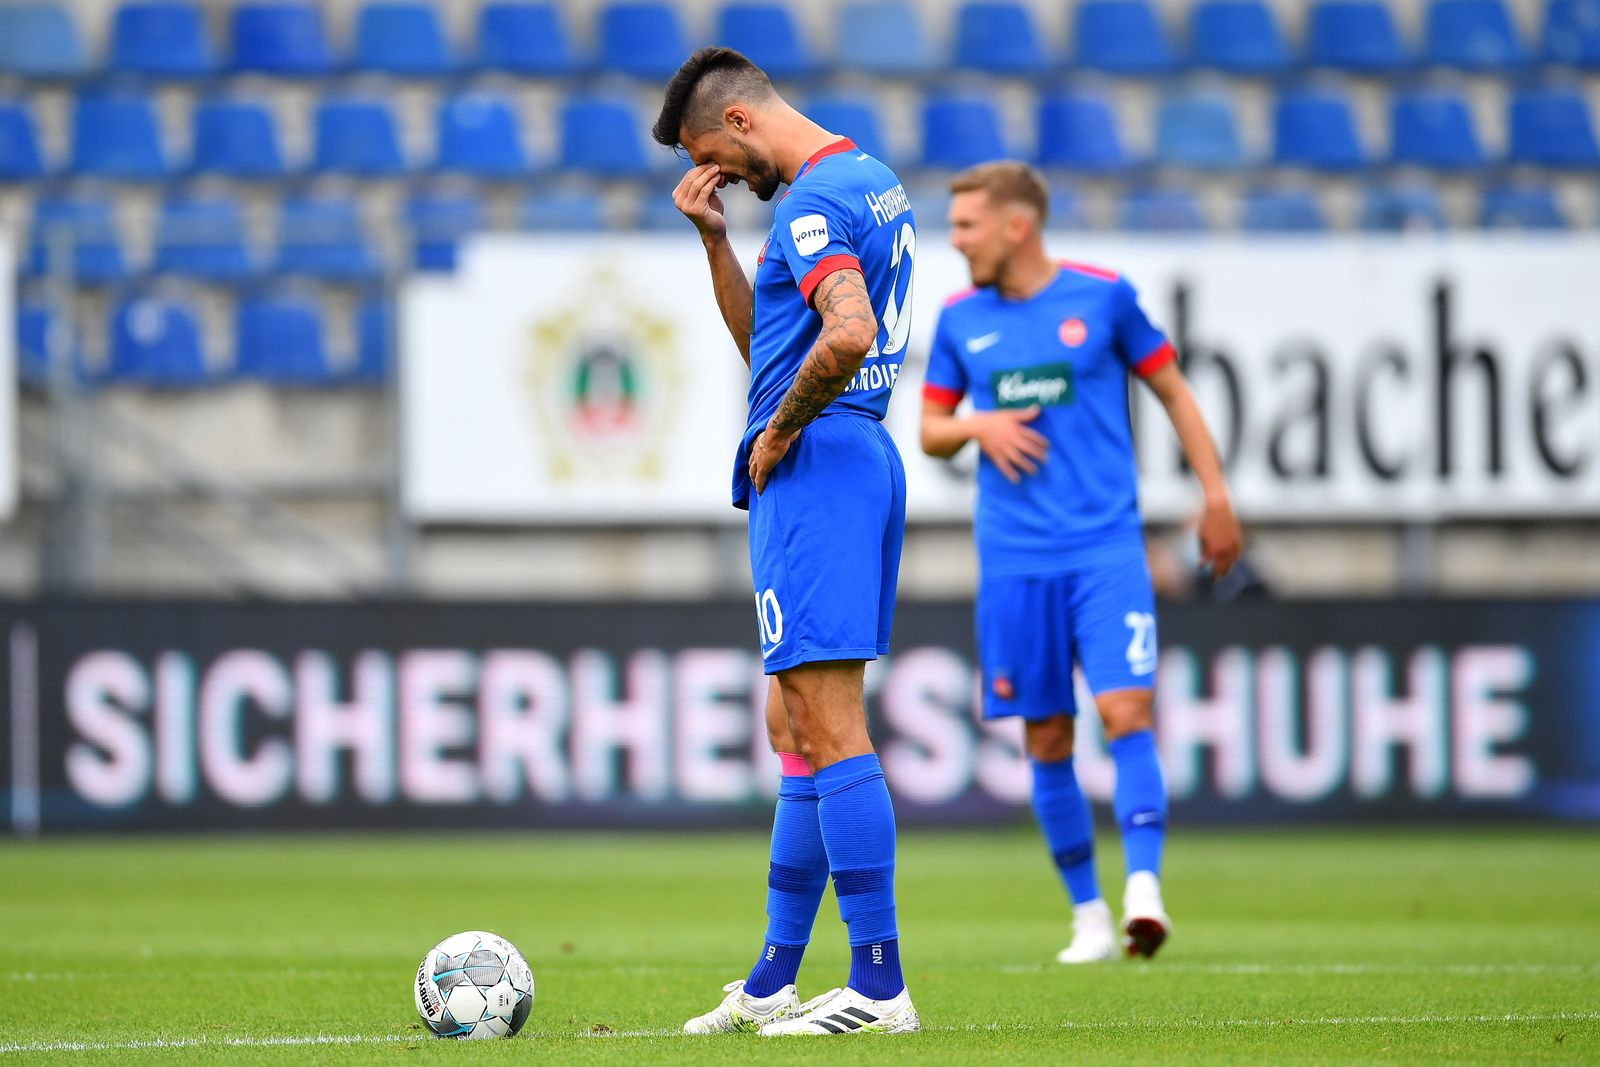 DSC Arminia Bielefeld v 1. FC Heidenheim 1846 - Second Bundesliga